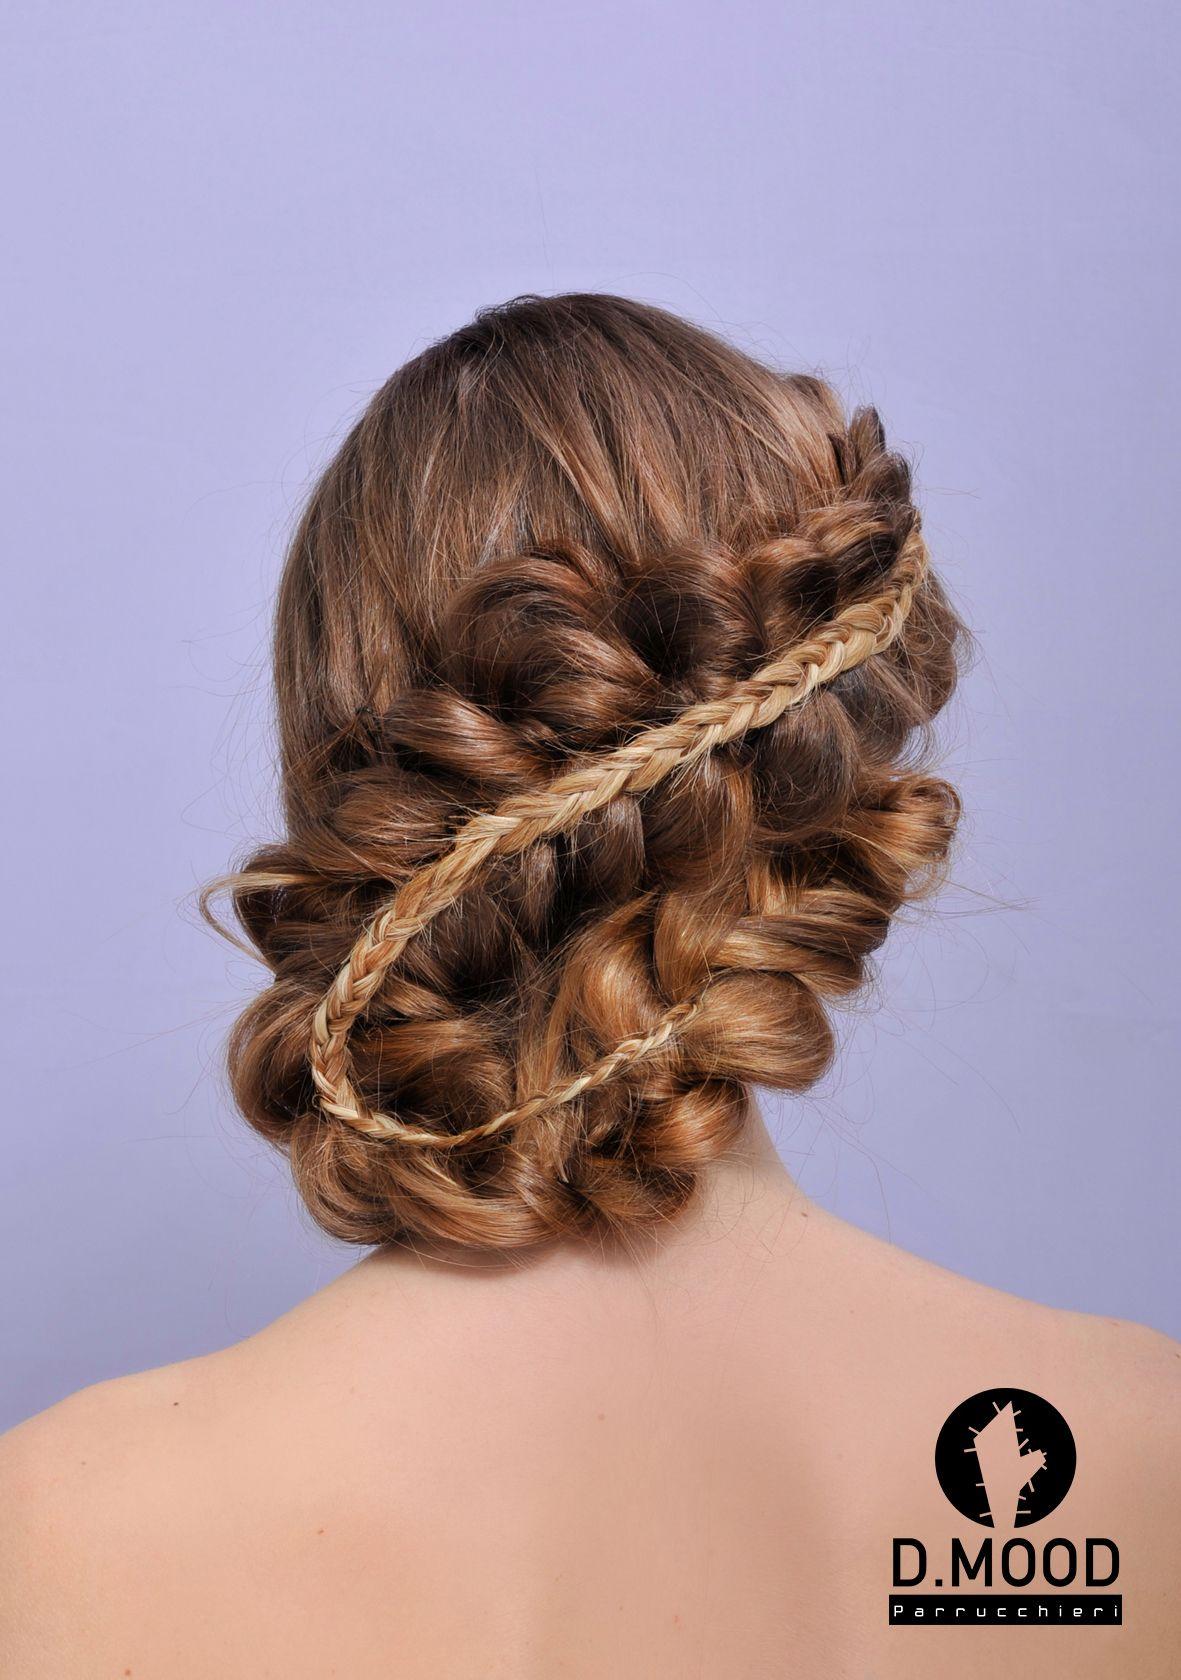 collezione ESSENTIAL P/E 16 #dmood #hair #cut #woman #hairlong # #color #haircut #wedding #acconciature #bride #dmoodneverstops